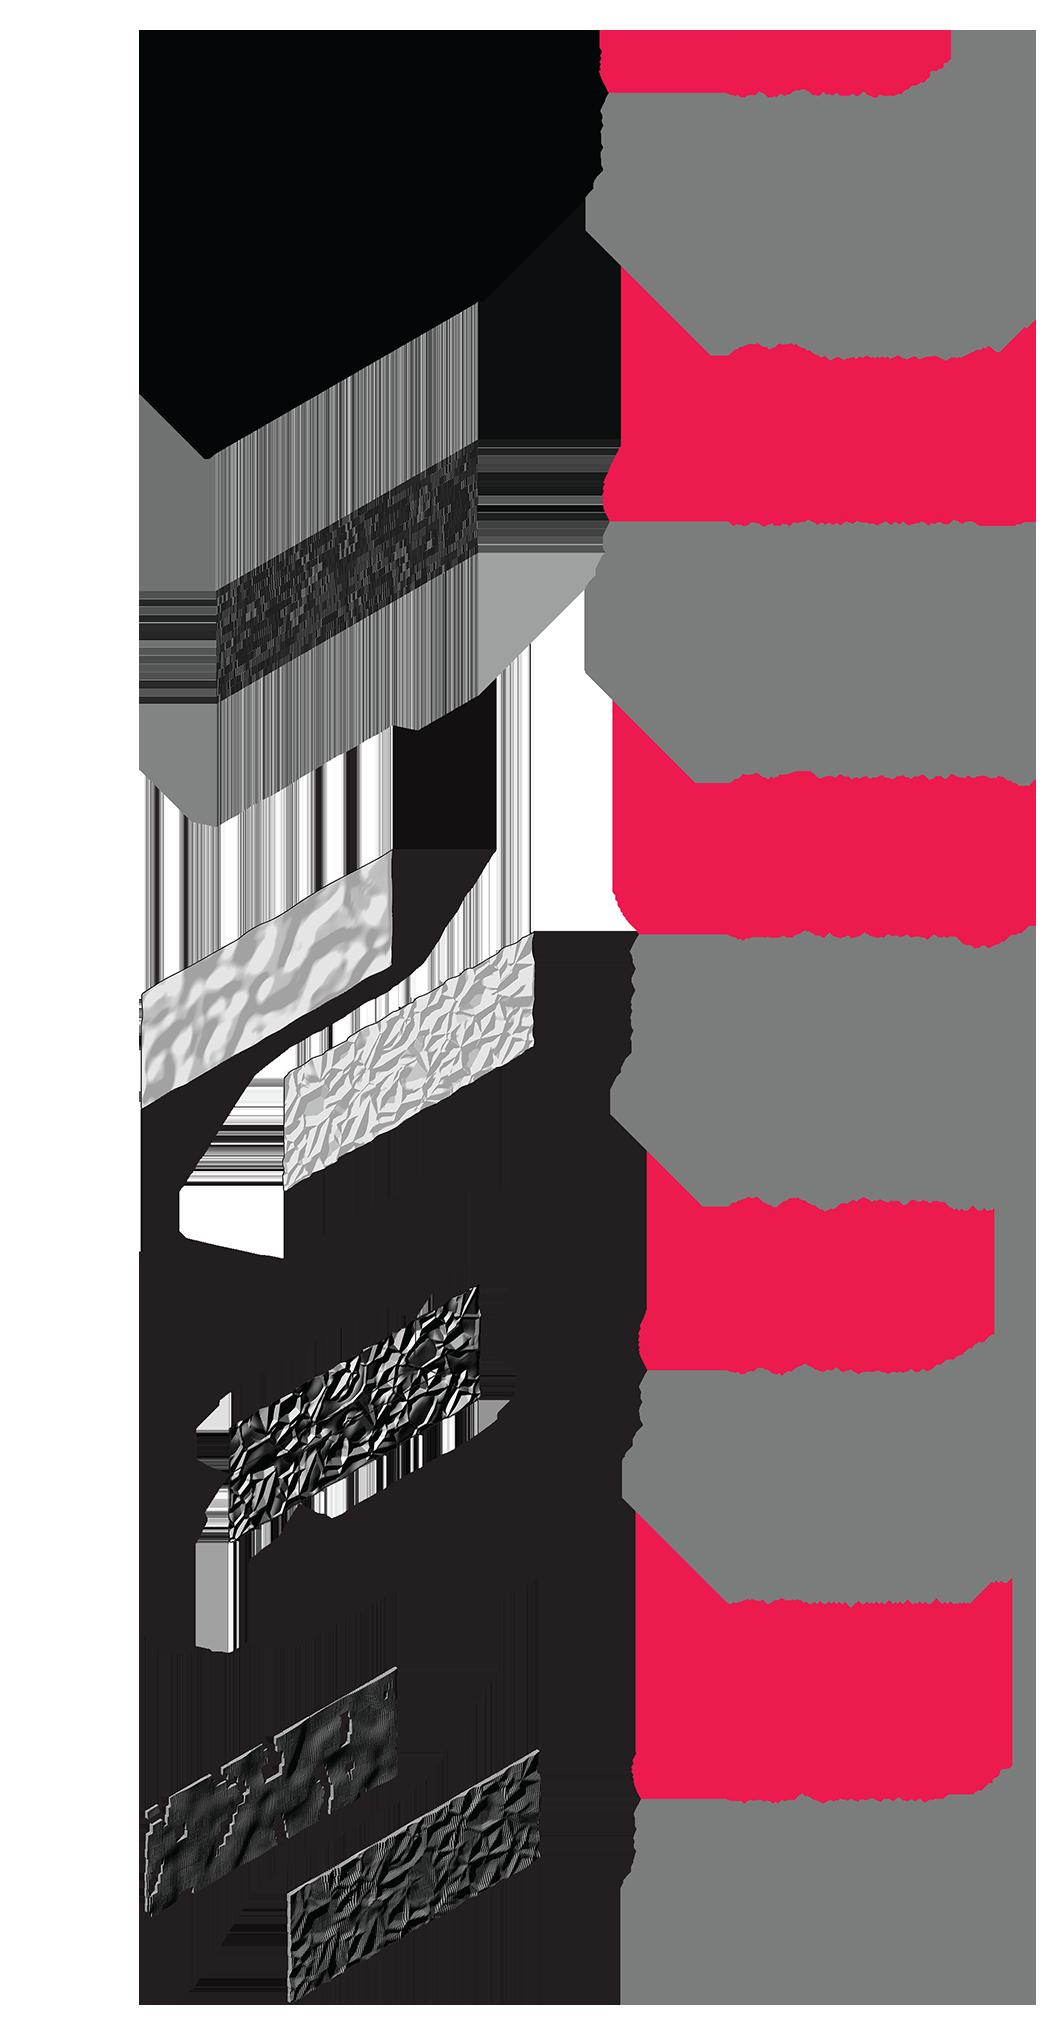 Bieg-WMB-Project_04_Diagrams01-1.png